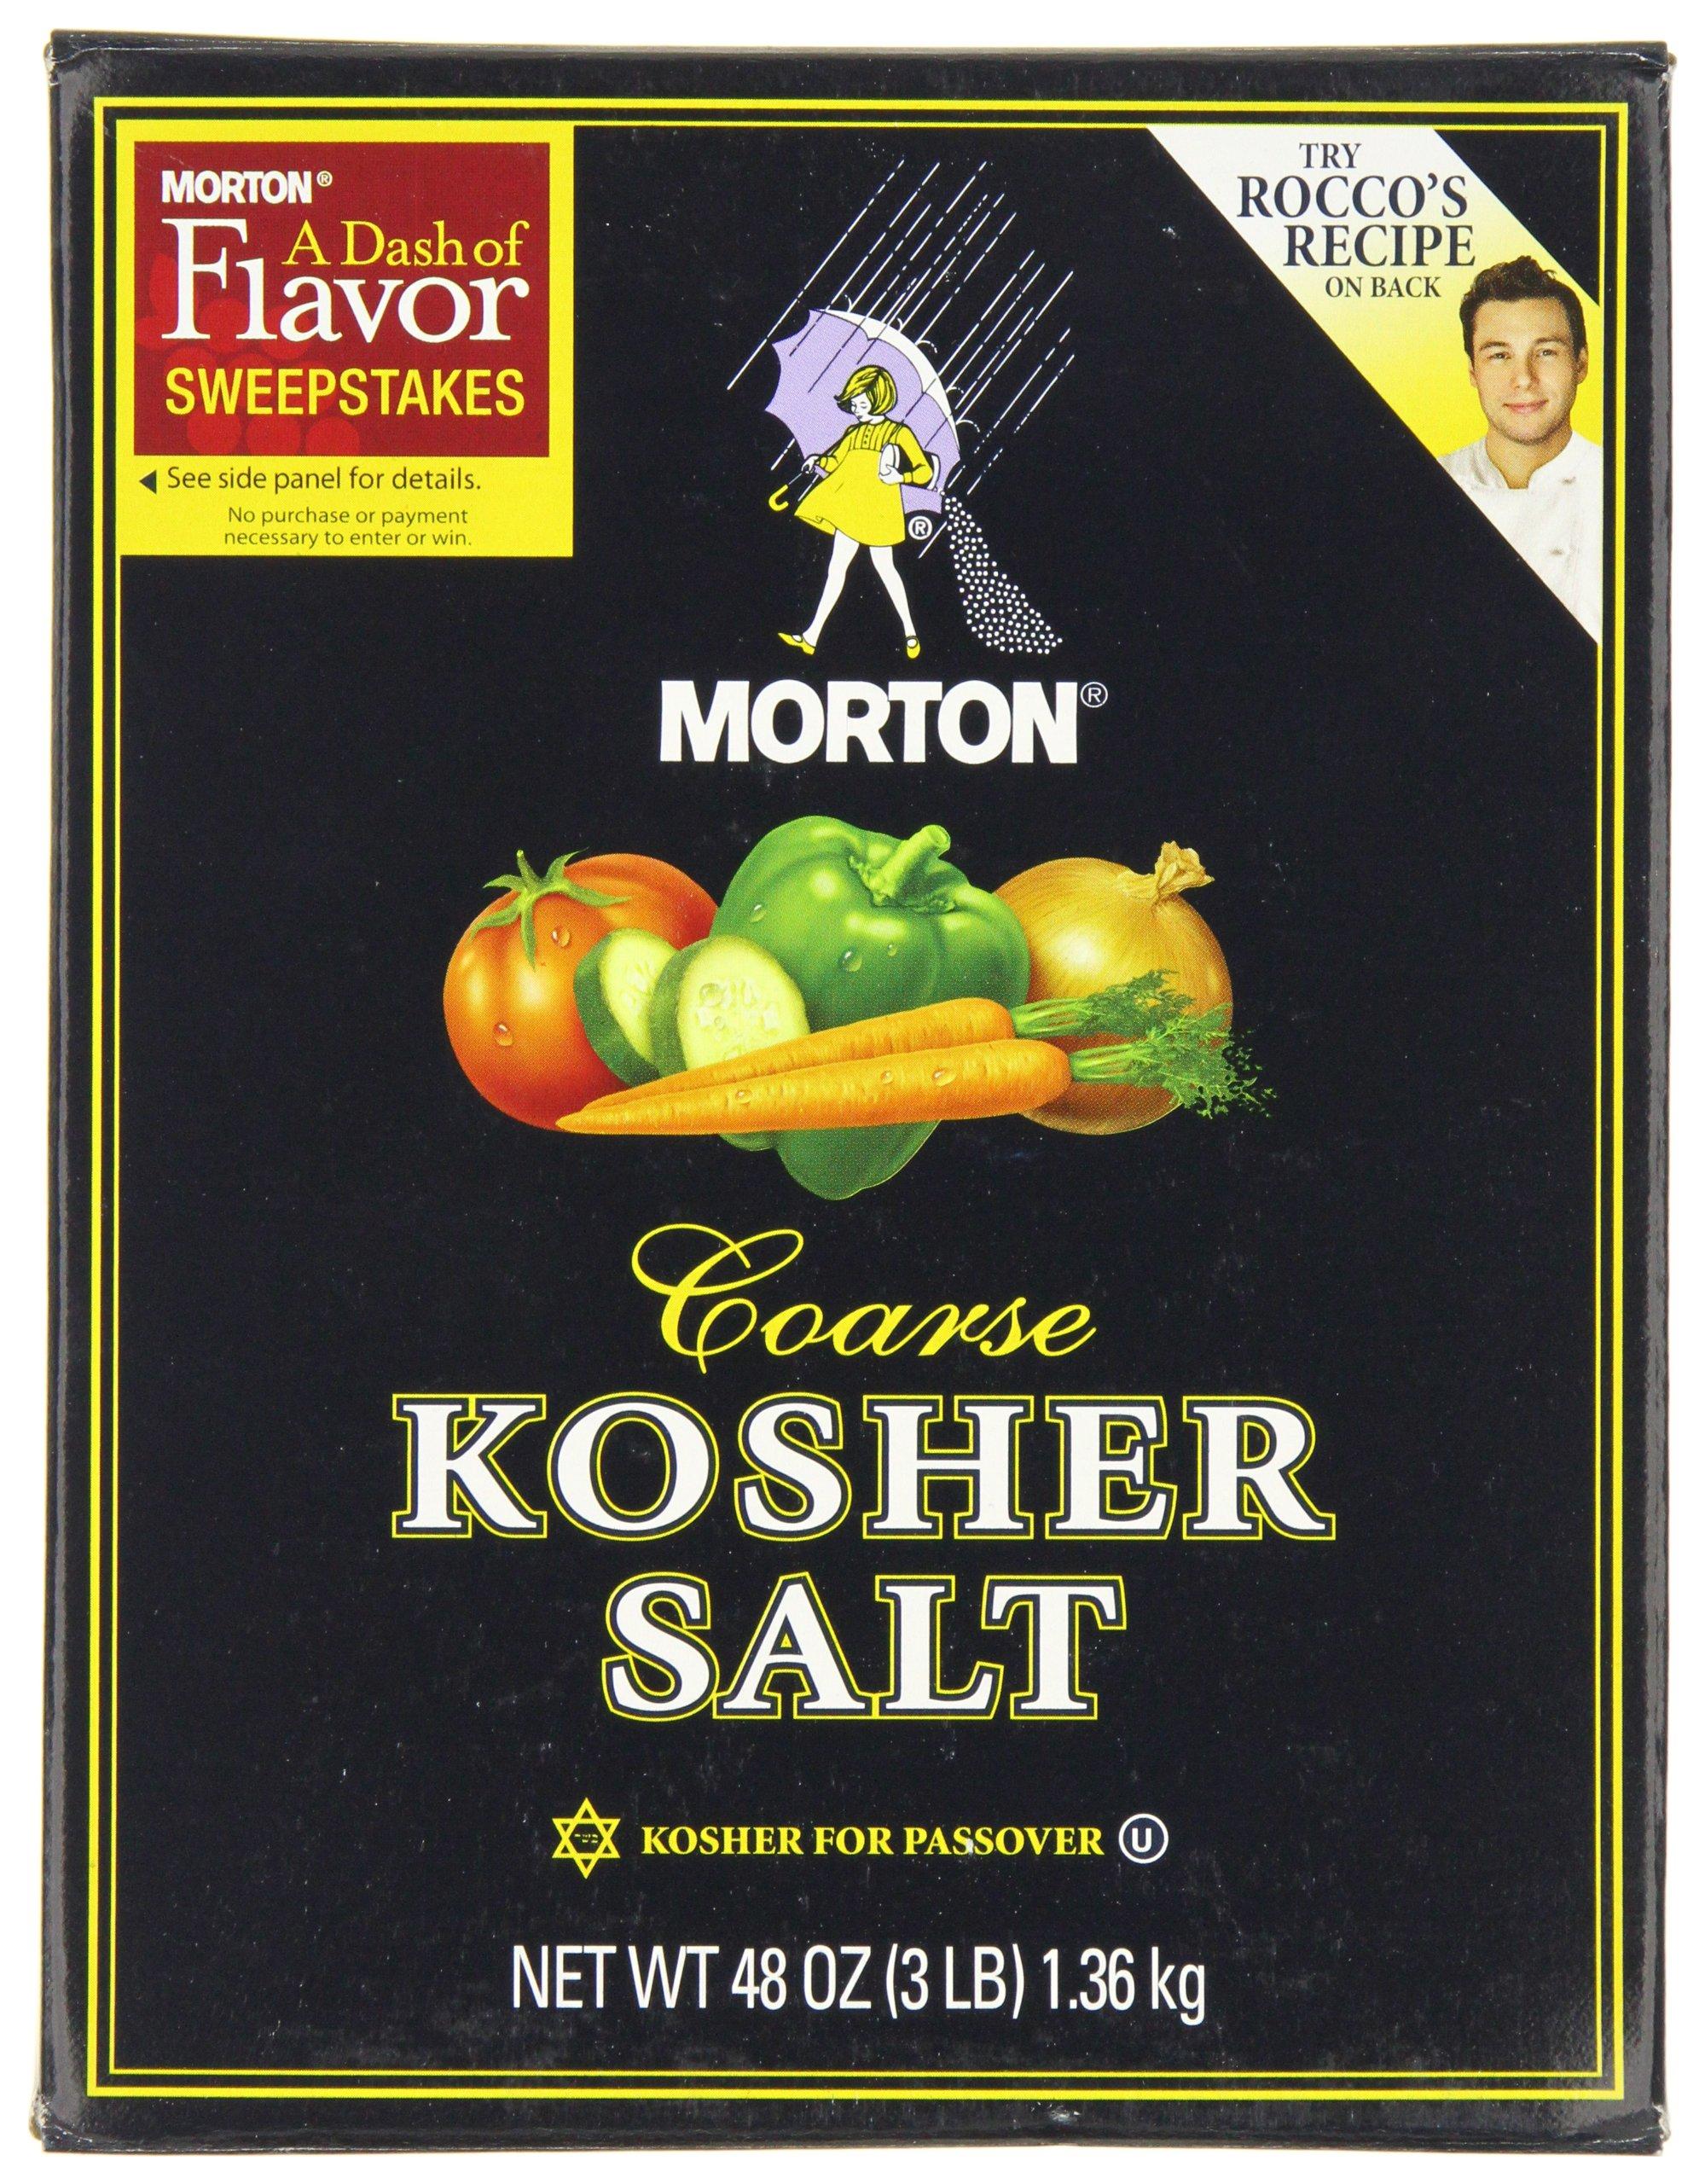 Morton Kosher Salt-Coarse, 3-Pounds (Pack of 12) by Morton (Image #1)